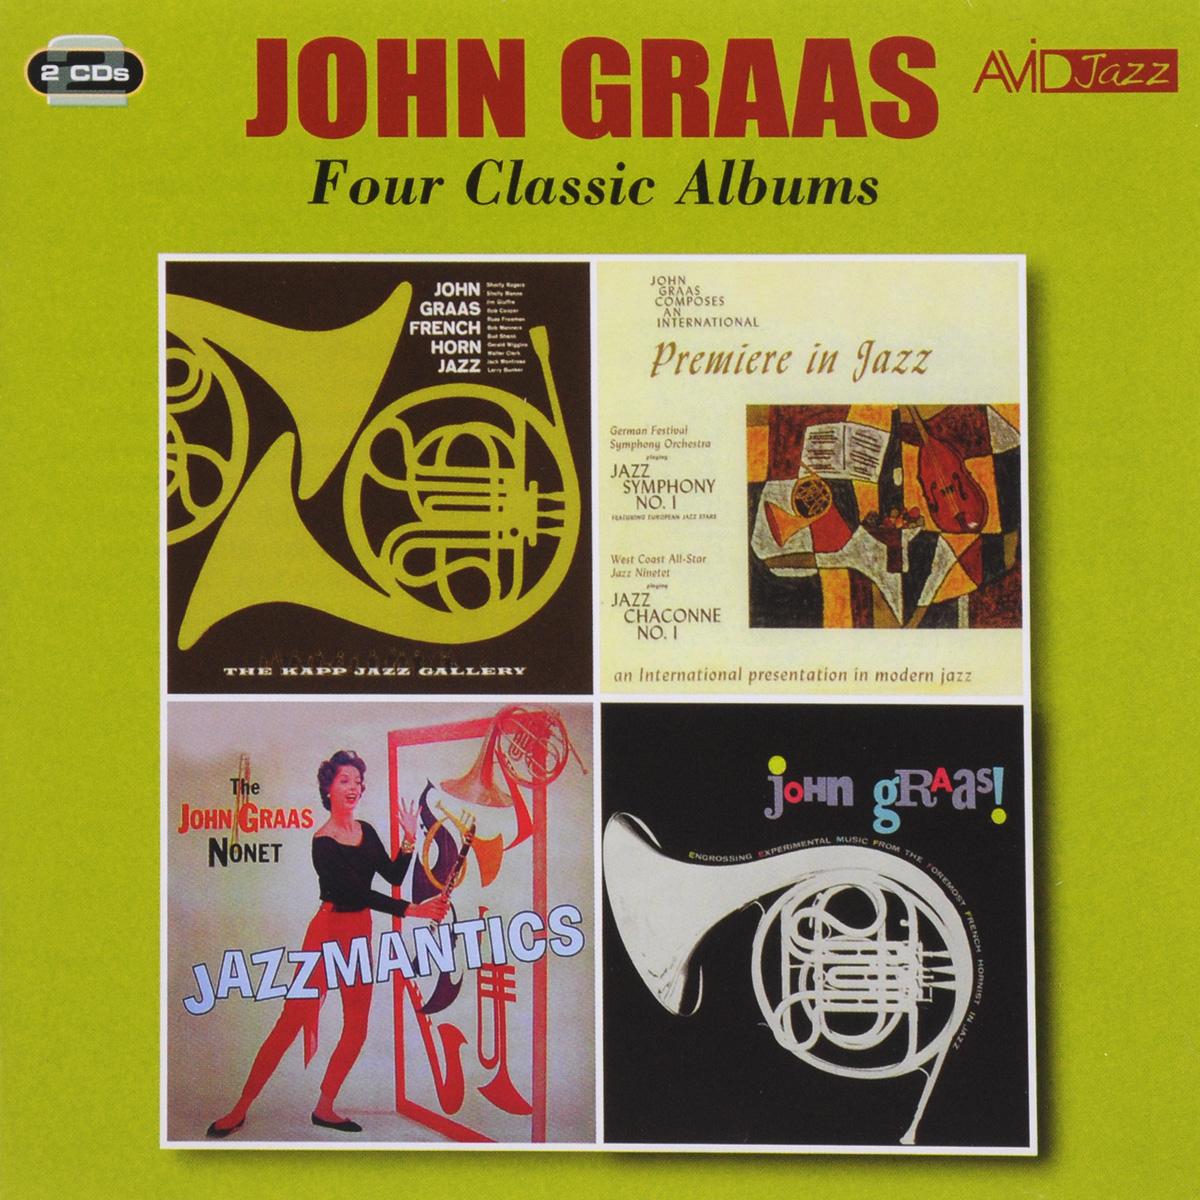 Джон Граас John Graas. Four Classic Albums (2 CD) avid dolby surround tools